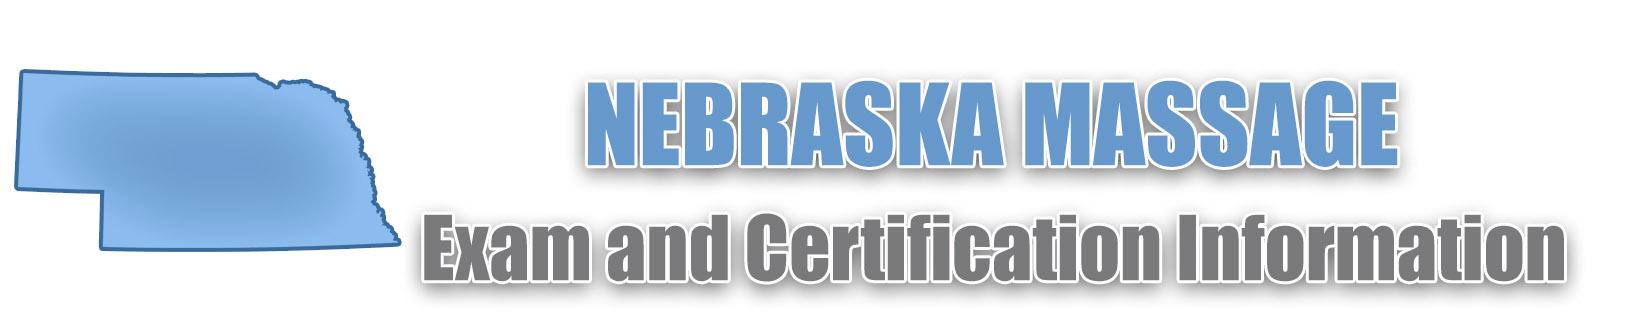 Nebraska Massage Therapy License For 2019 Board Application Requirements